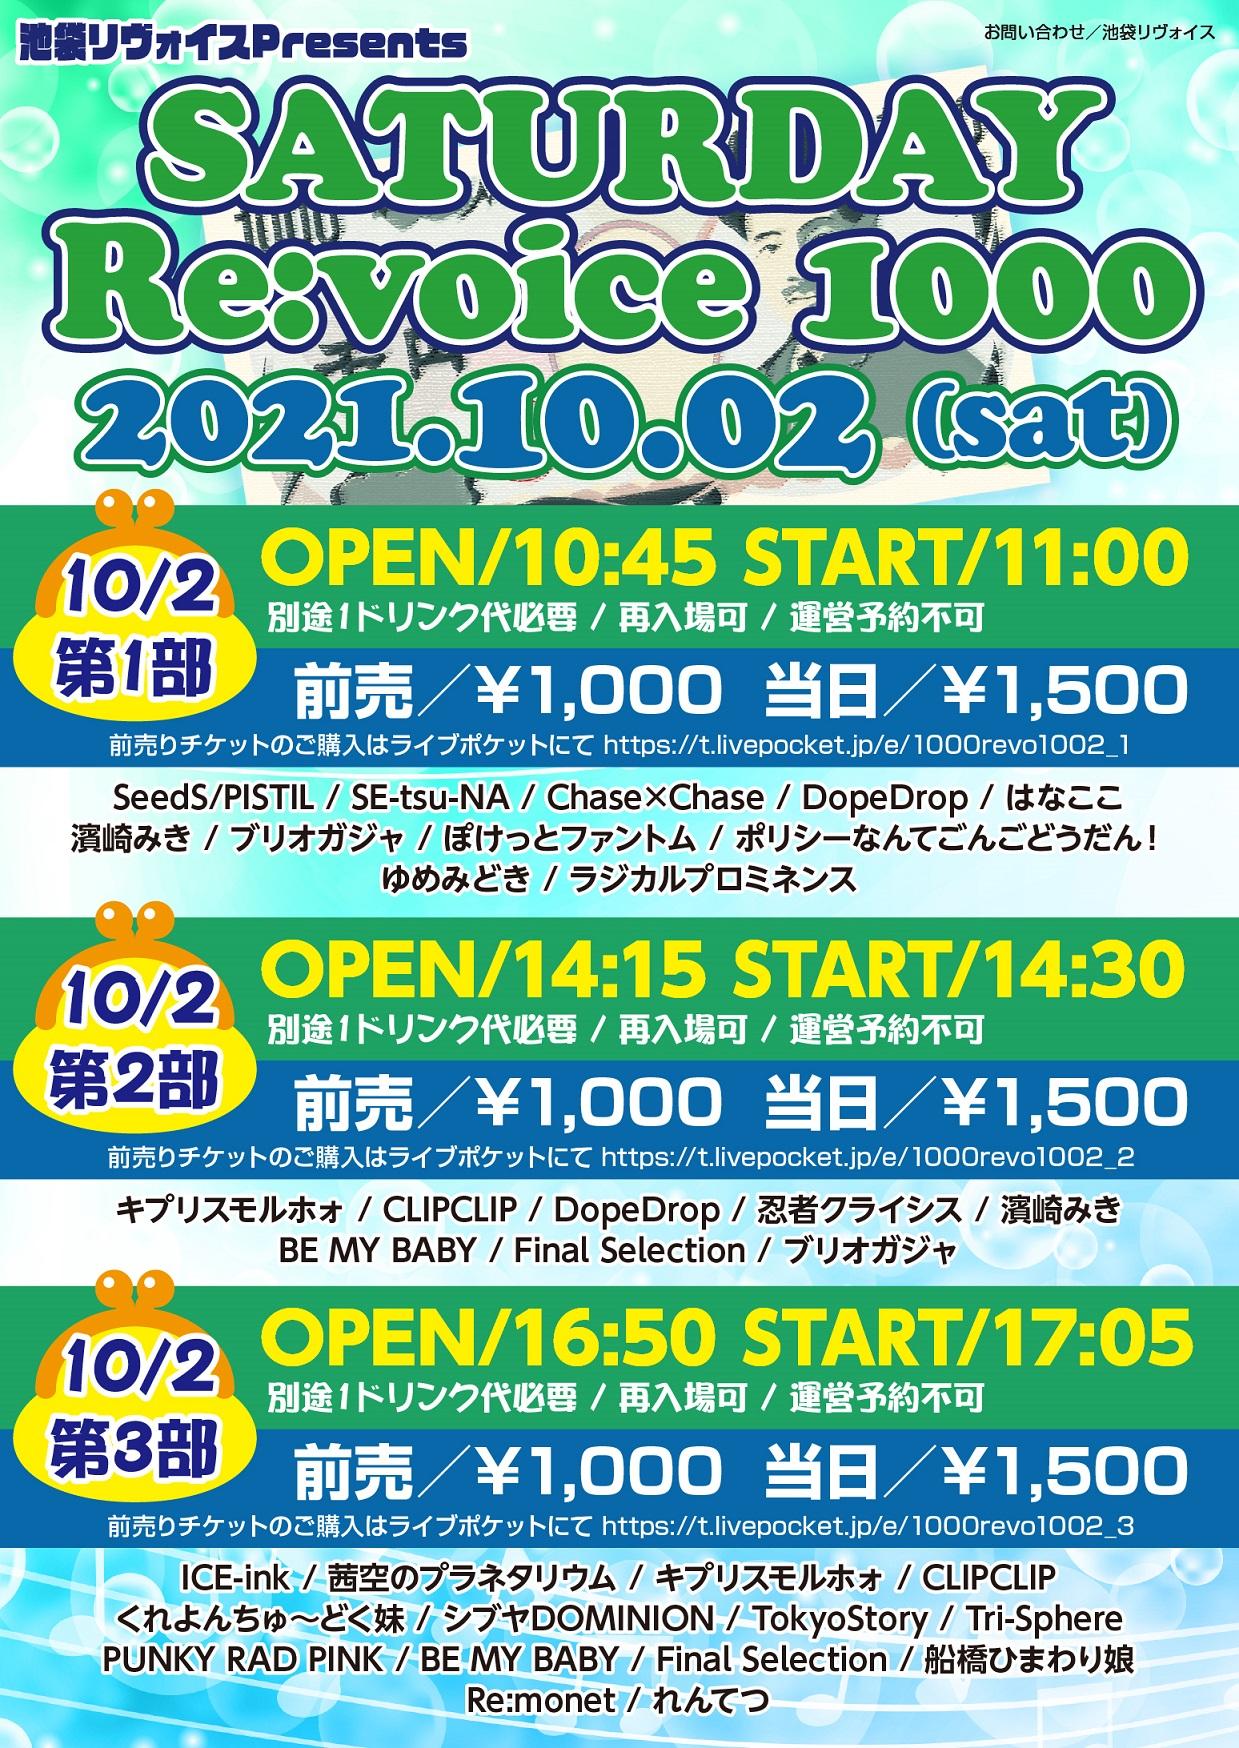 【第三部】SATURDAY Re:voice 1000